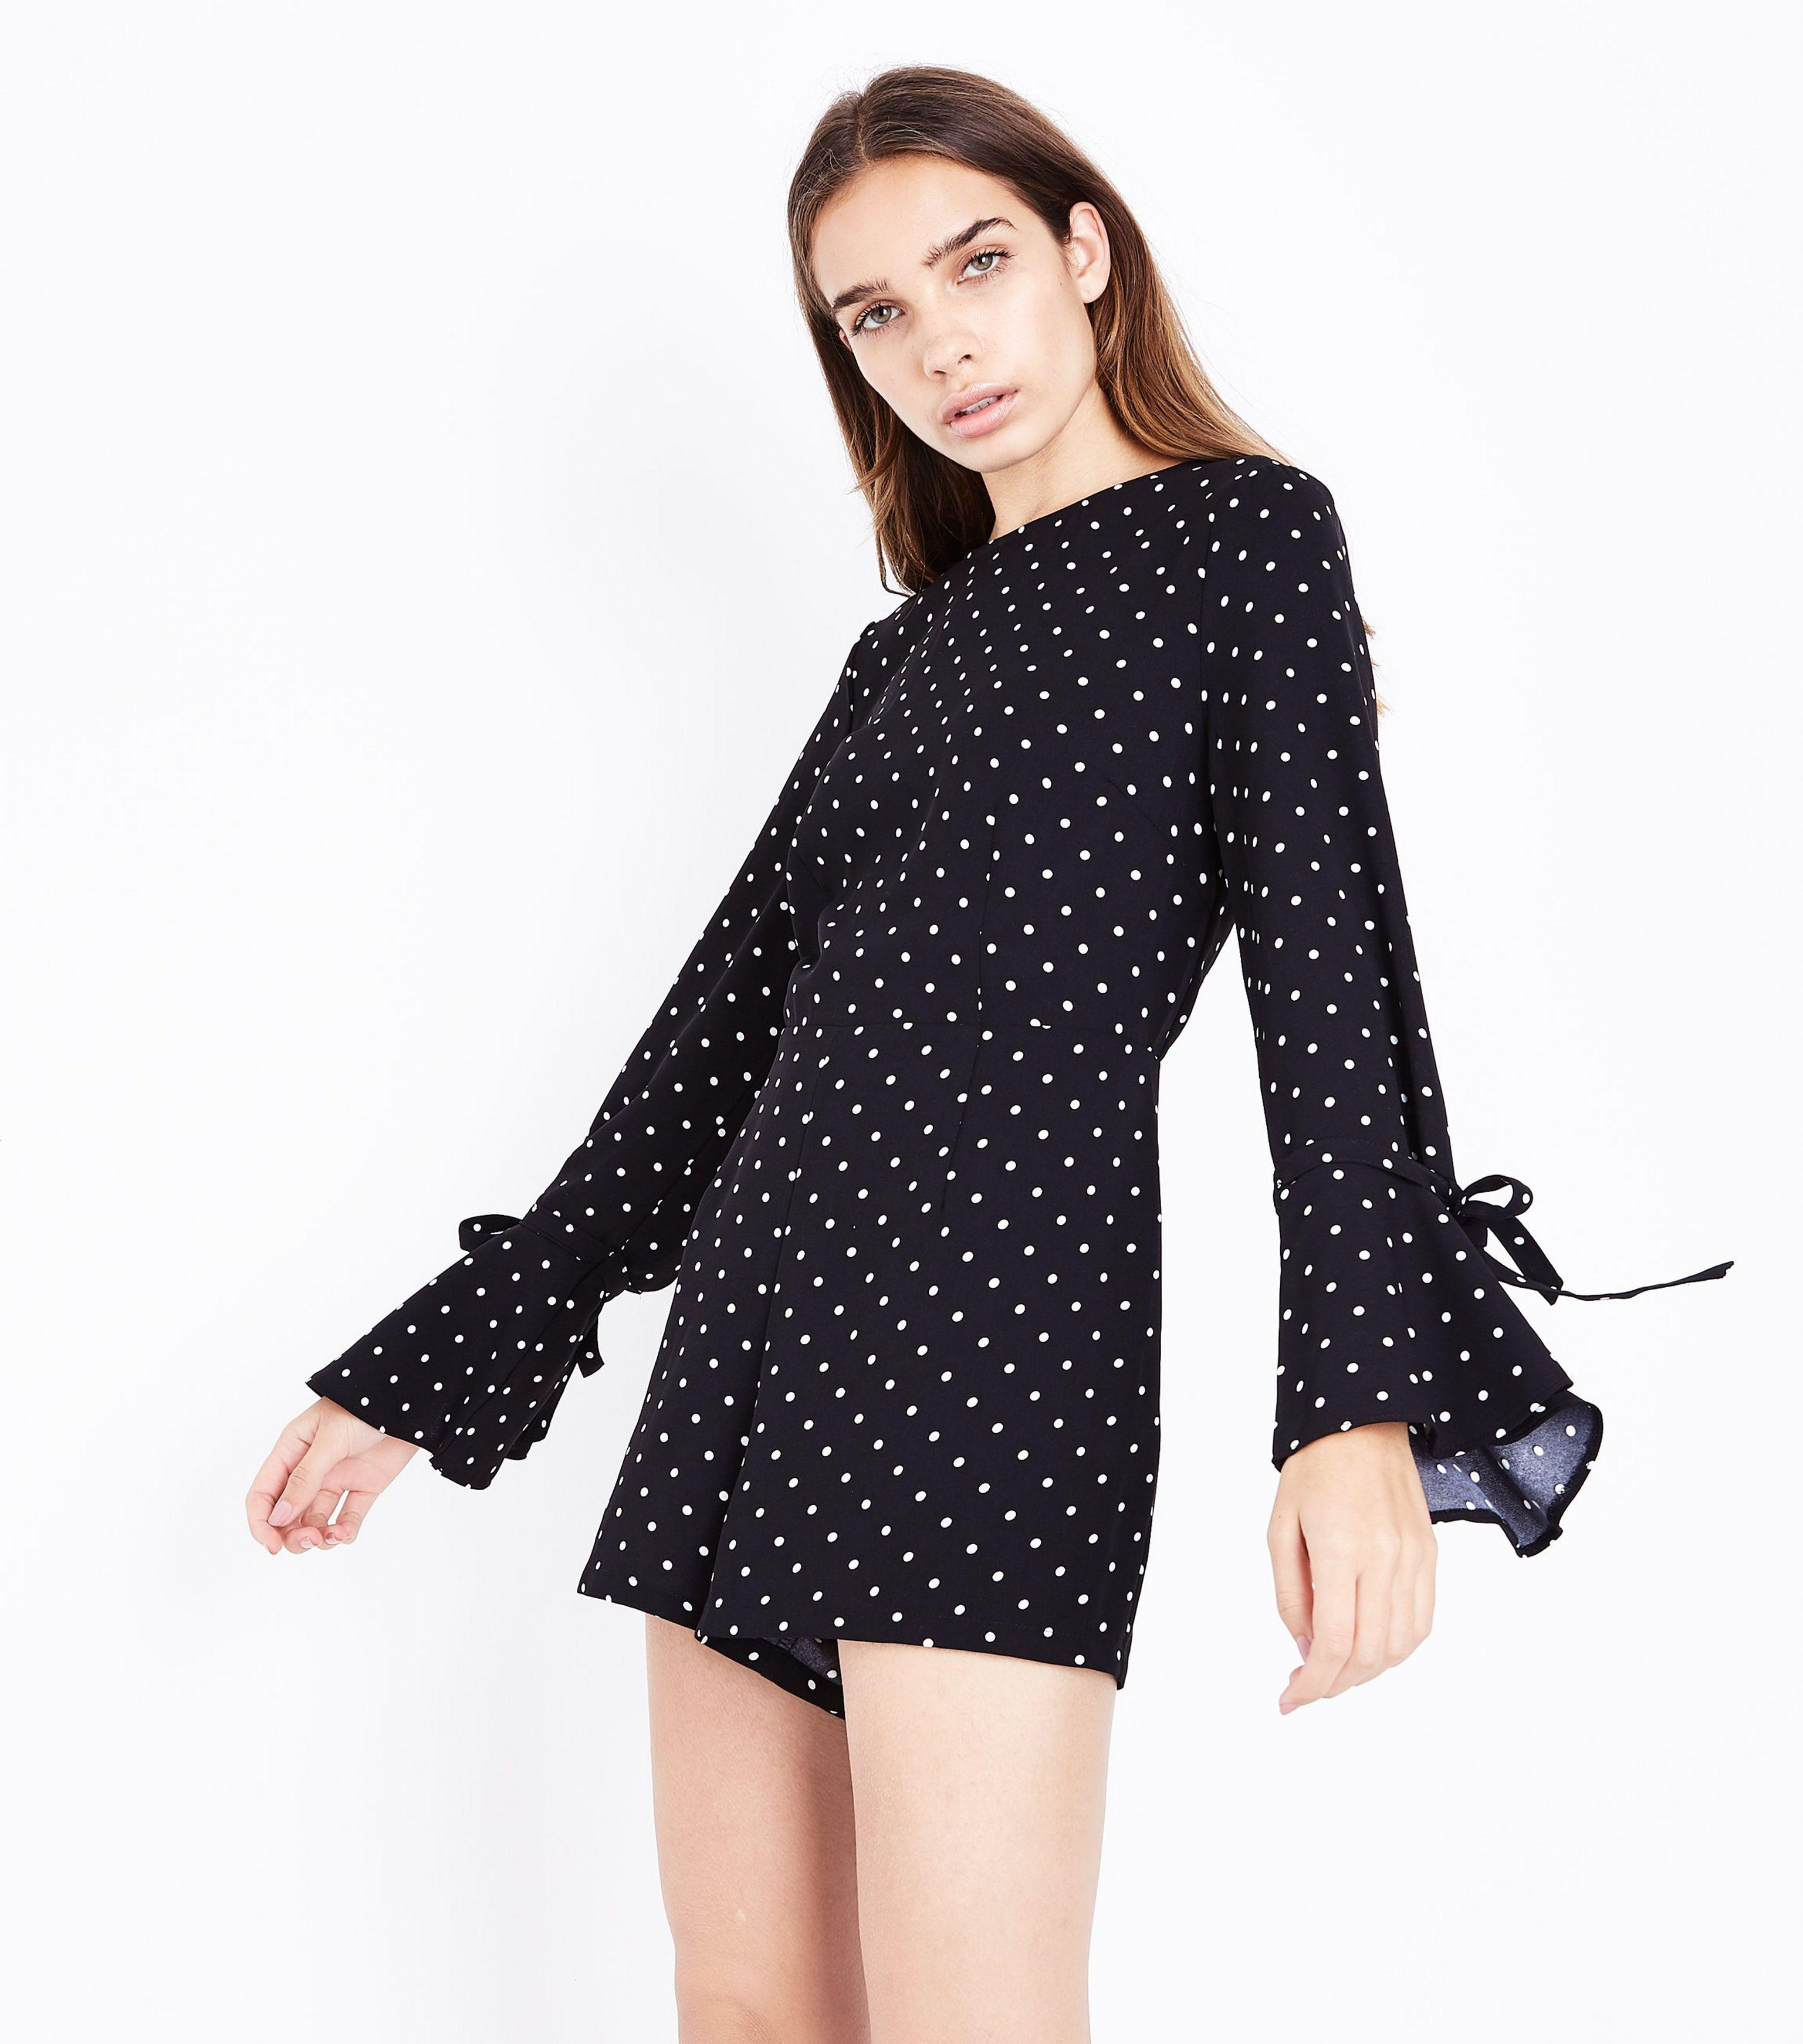 2222131a164 New Look Black Polka Dot Bell Sleeve Playsuit in Black - Lyst